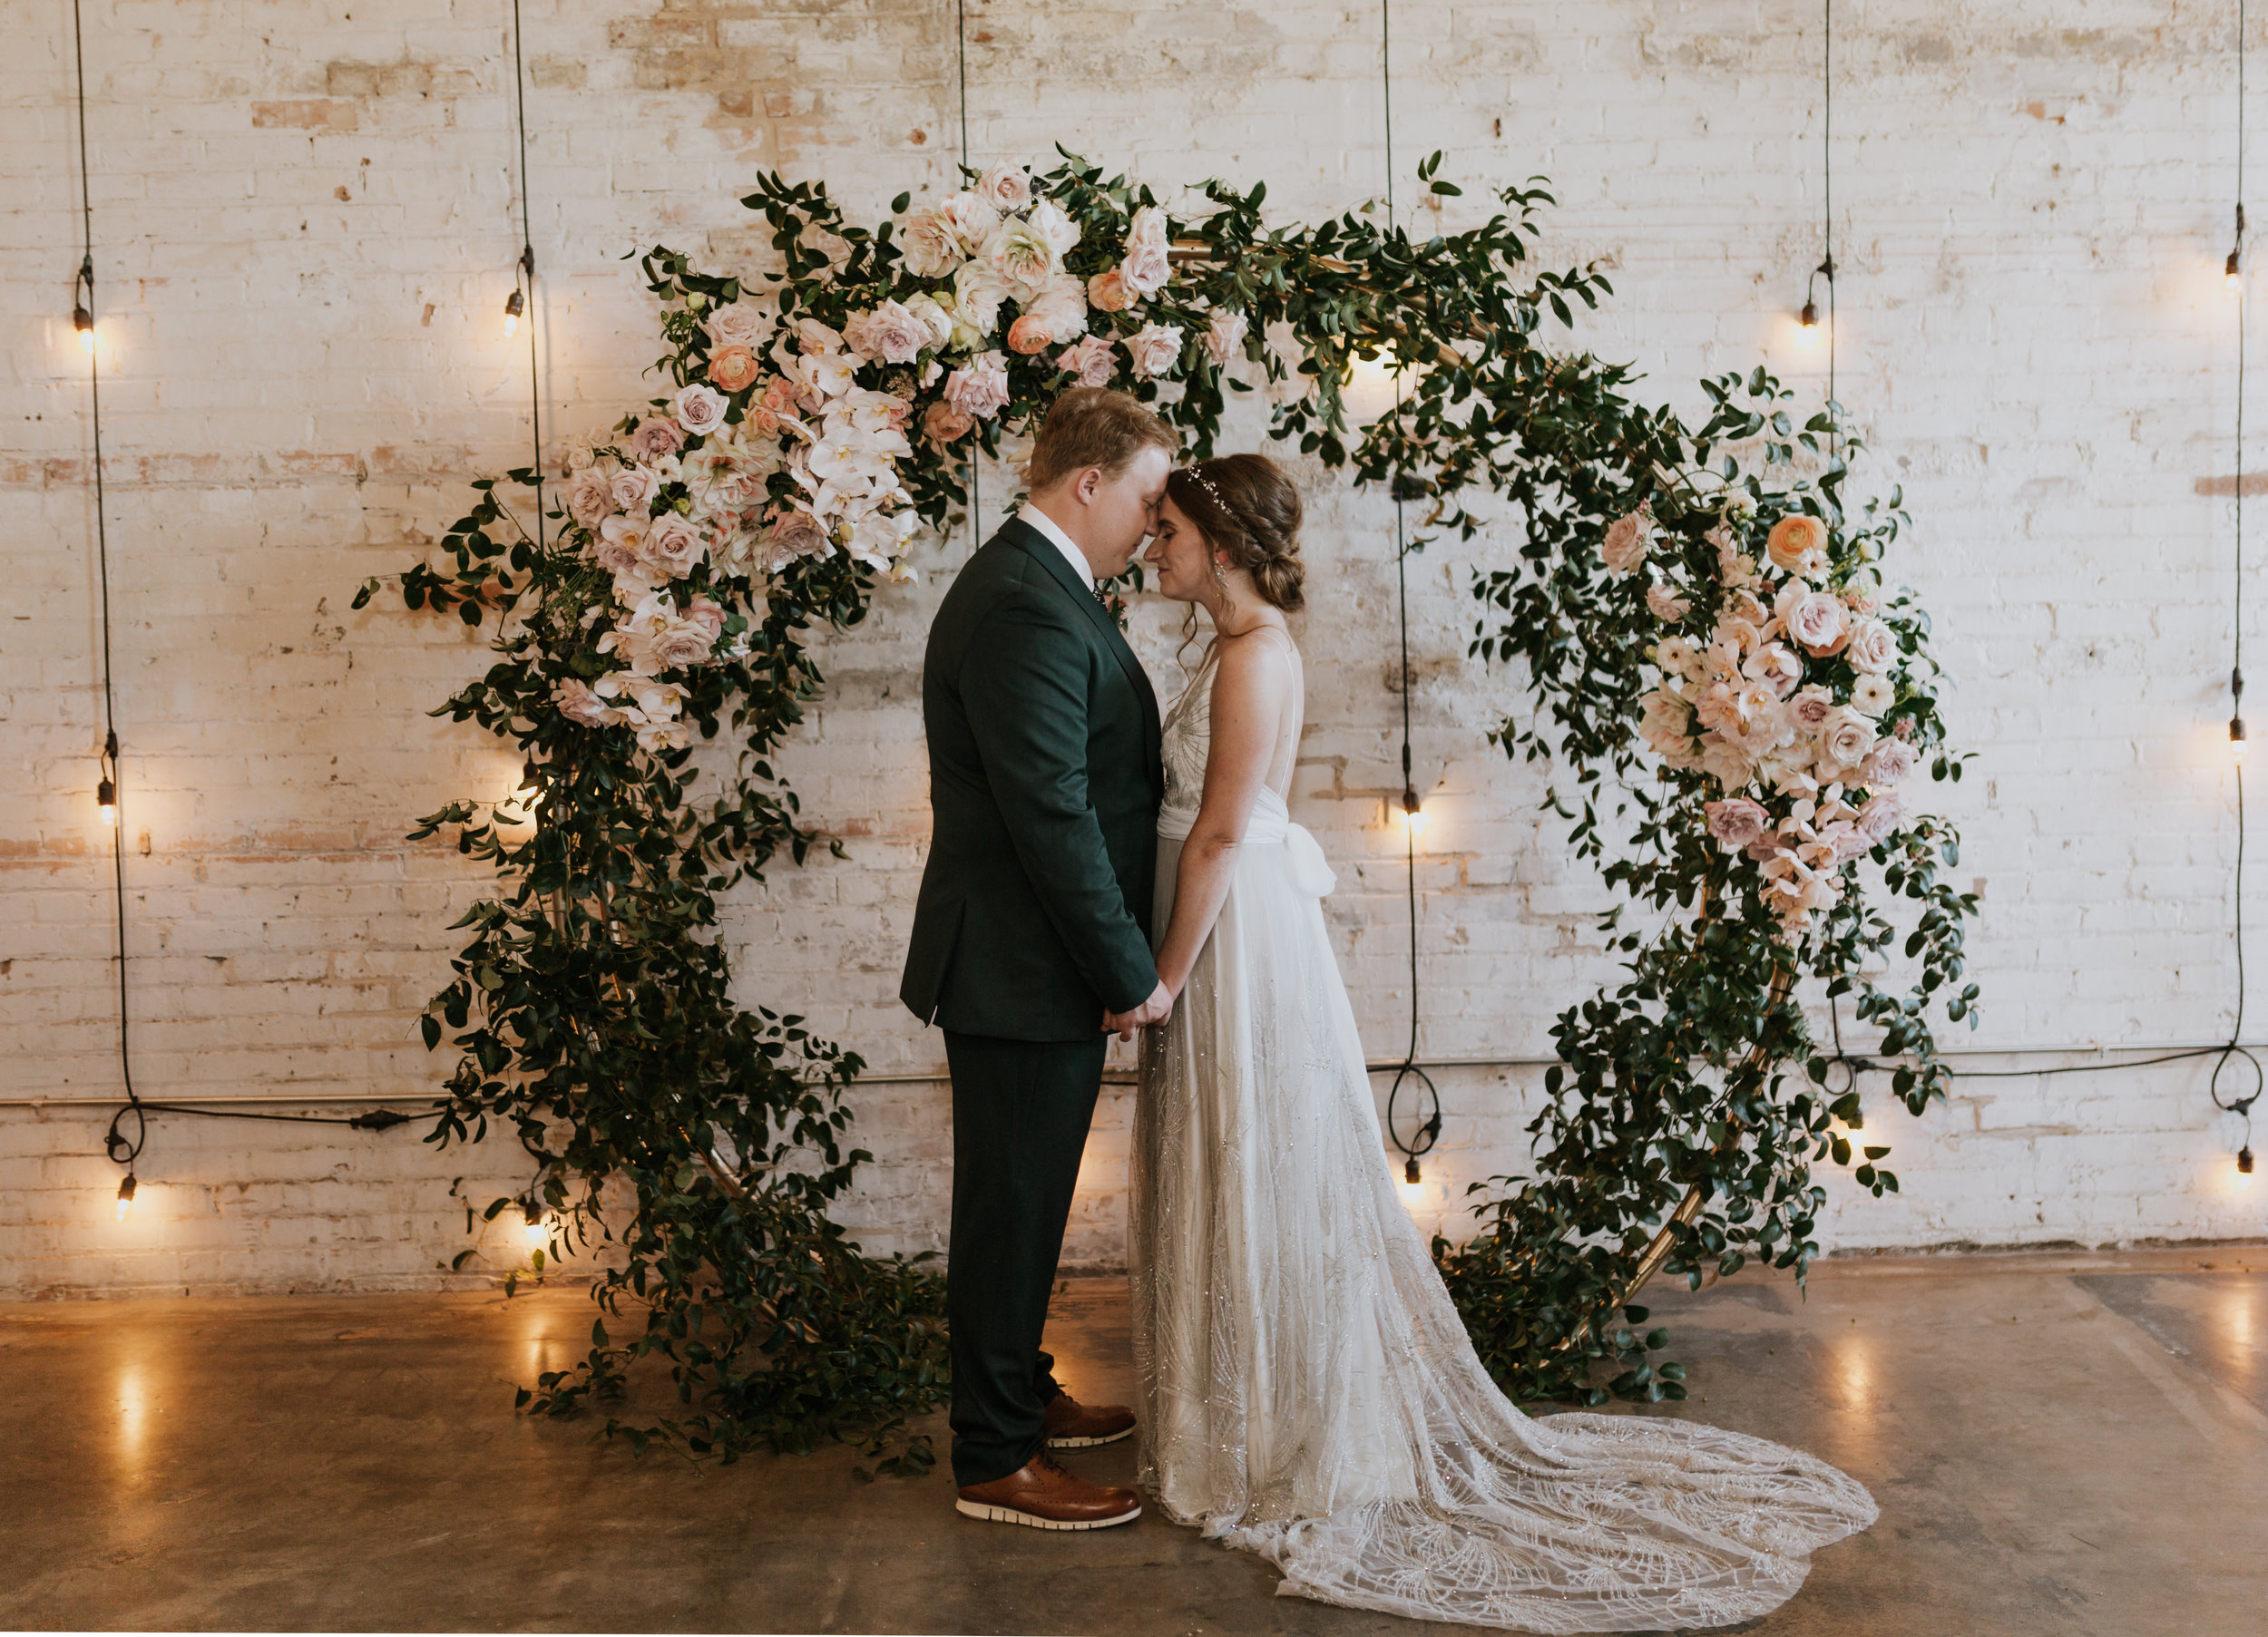 The Ellis Wedding - Annabel + Scott  -Sneak Peeks - Meme Urbane Photography_-8.jpg